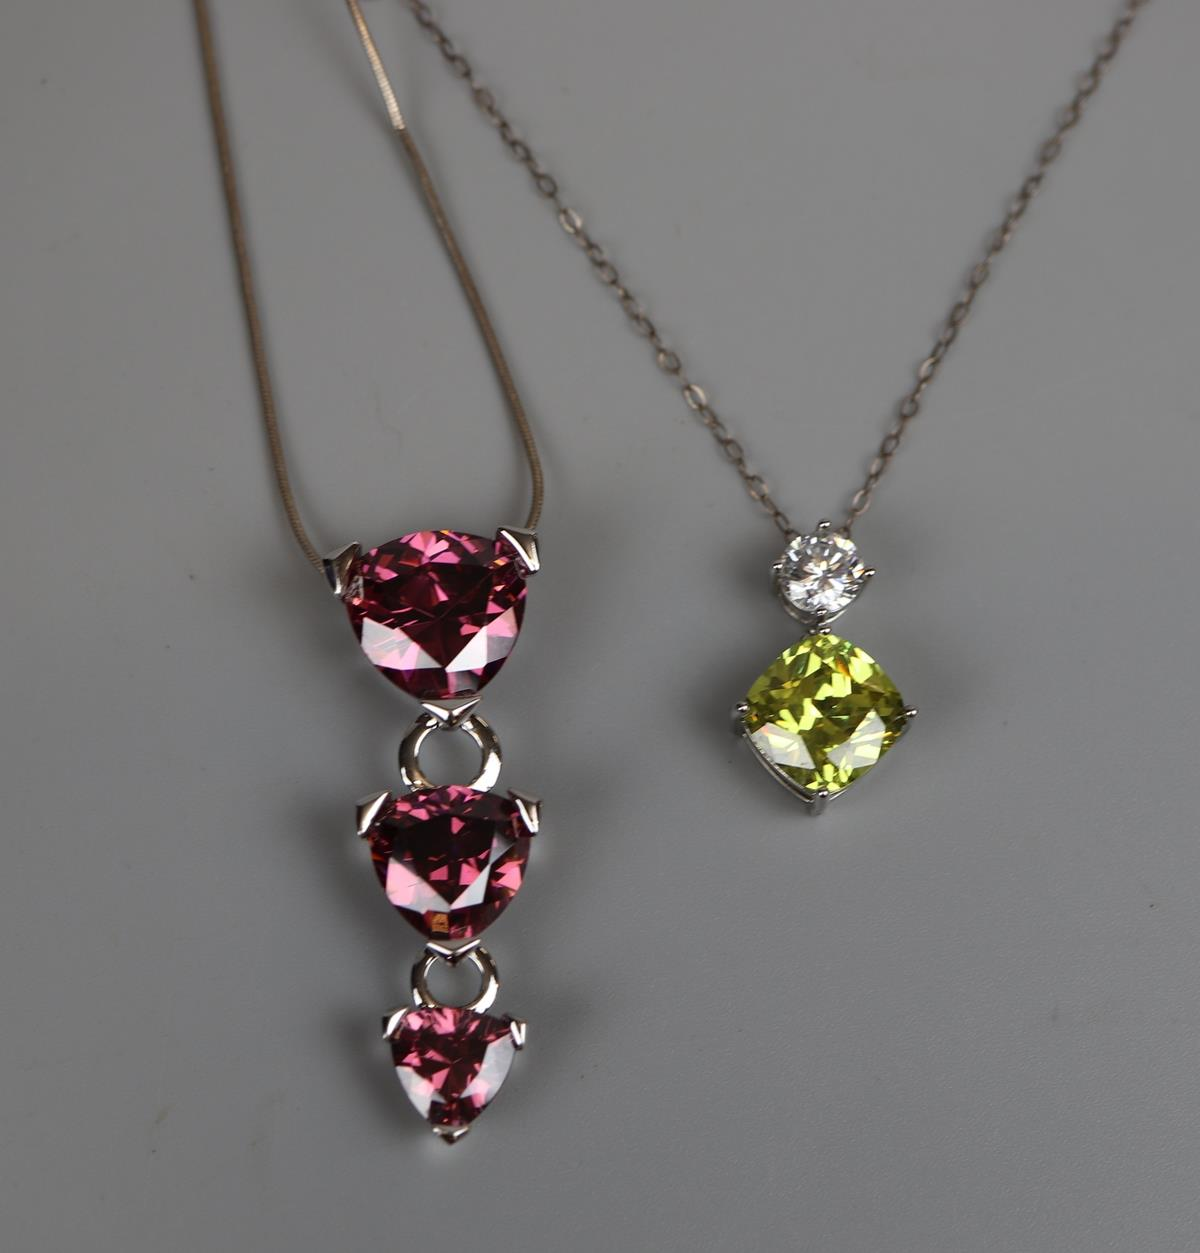 2 pendants on chains